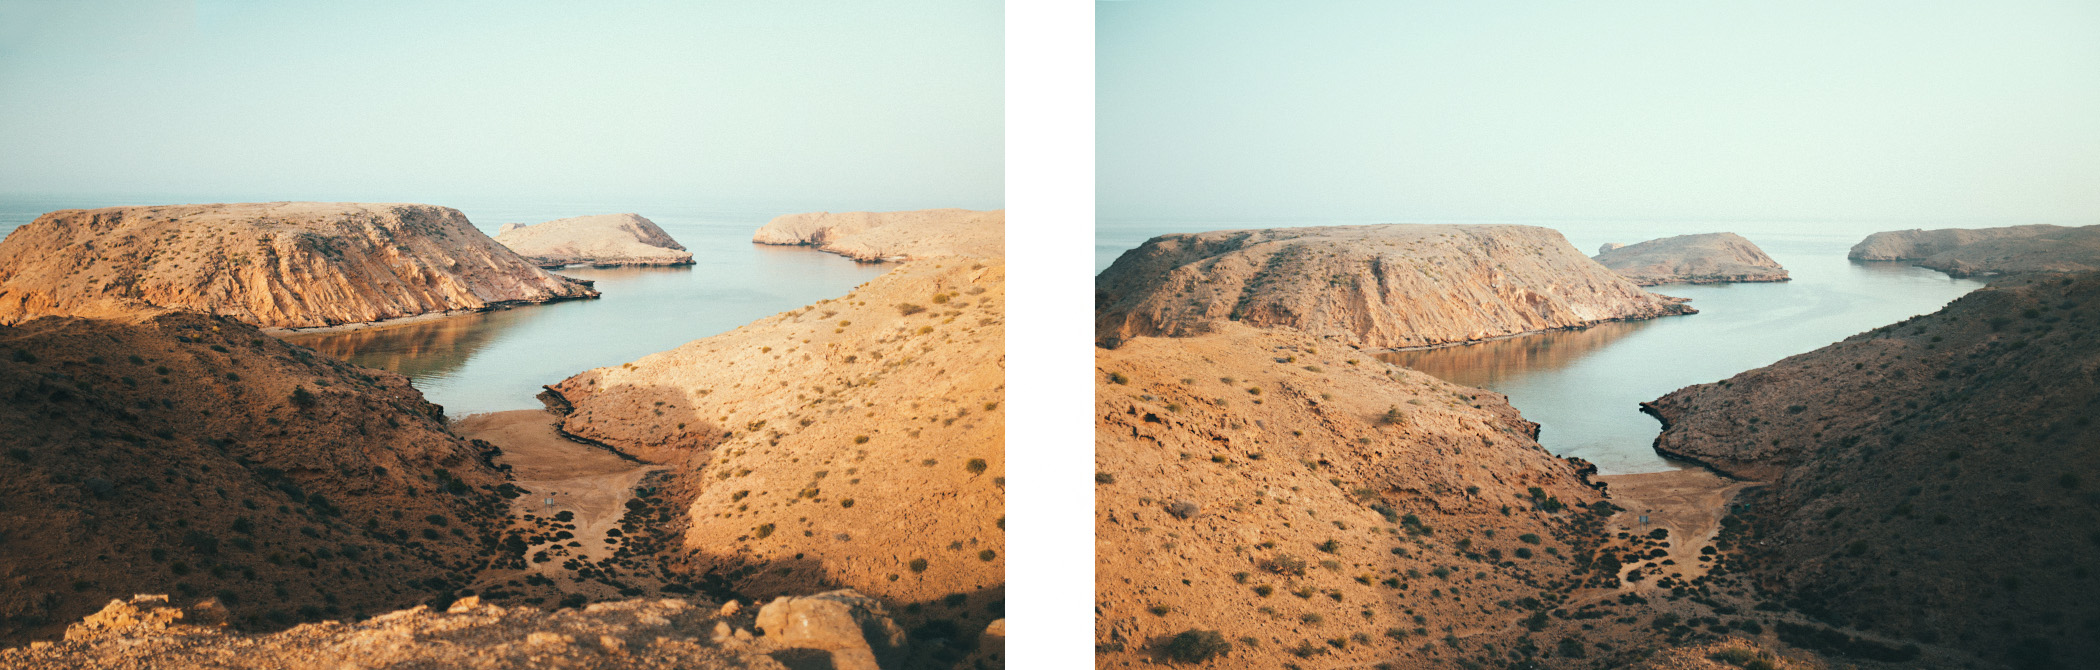 Bandar Al Khairan, Oman